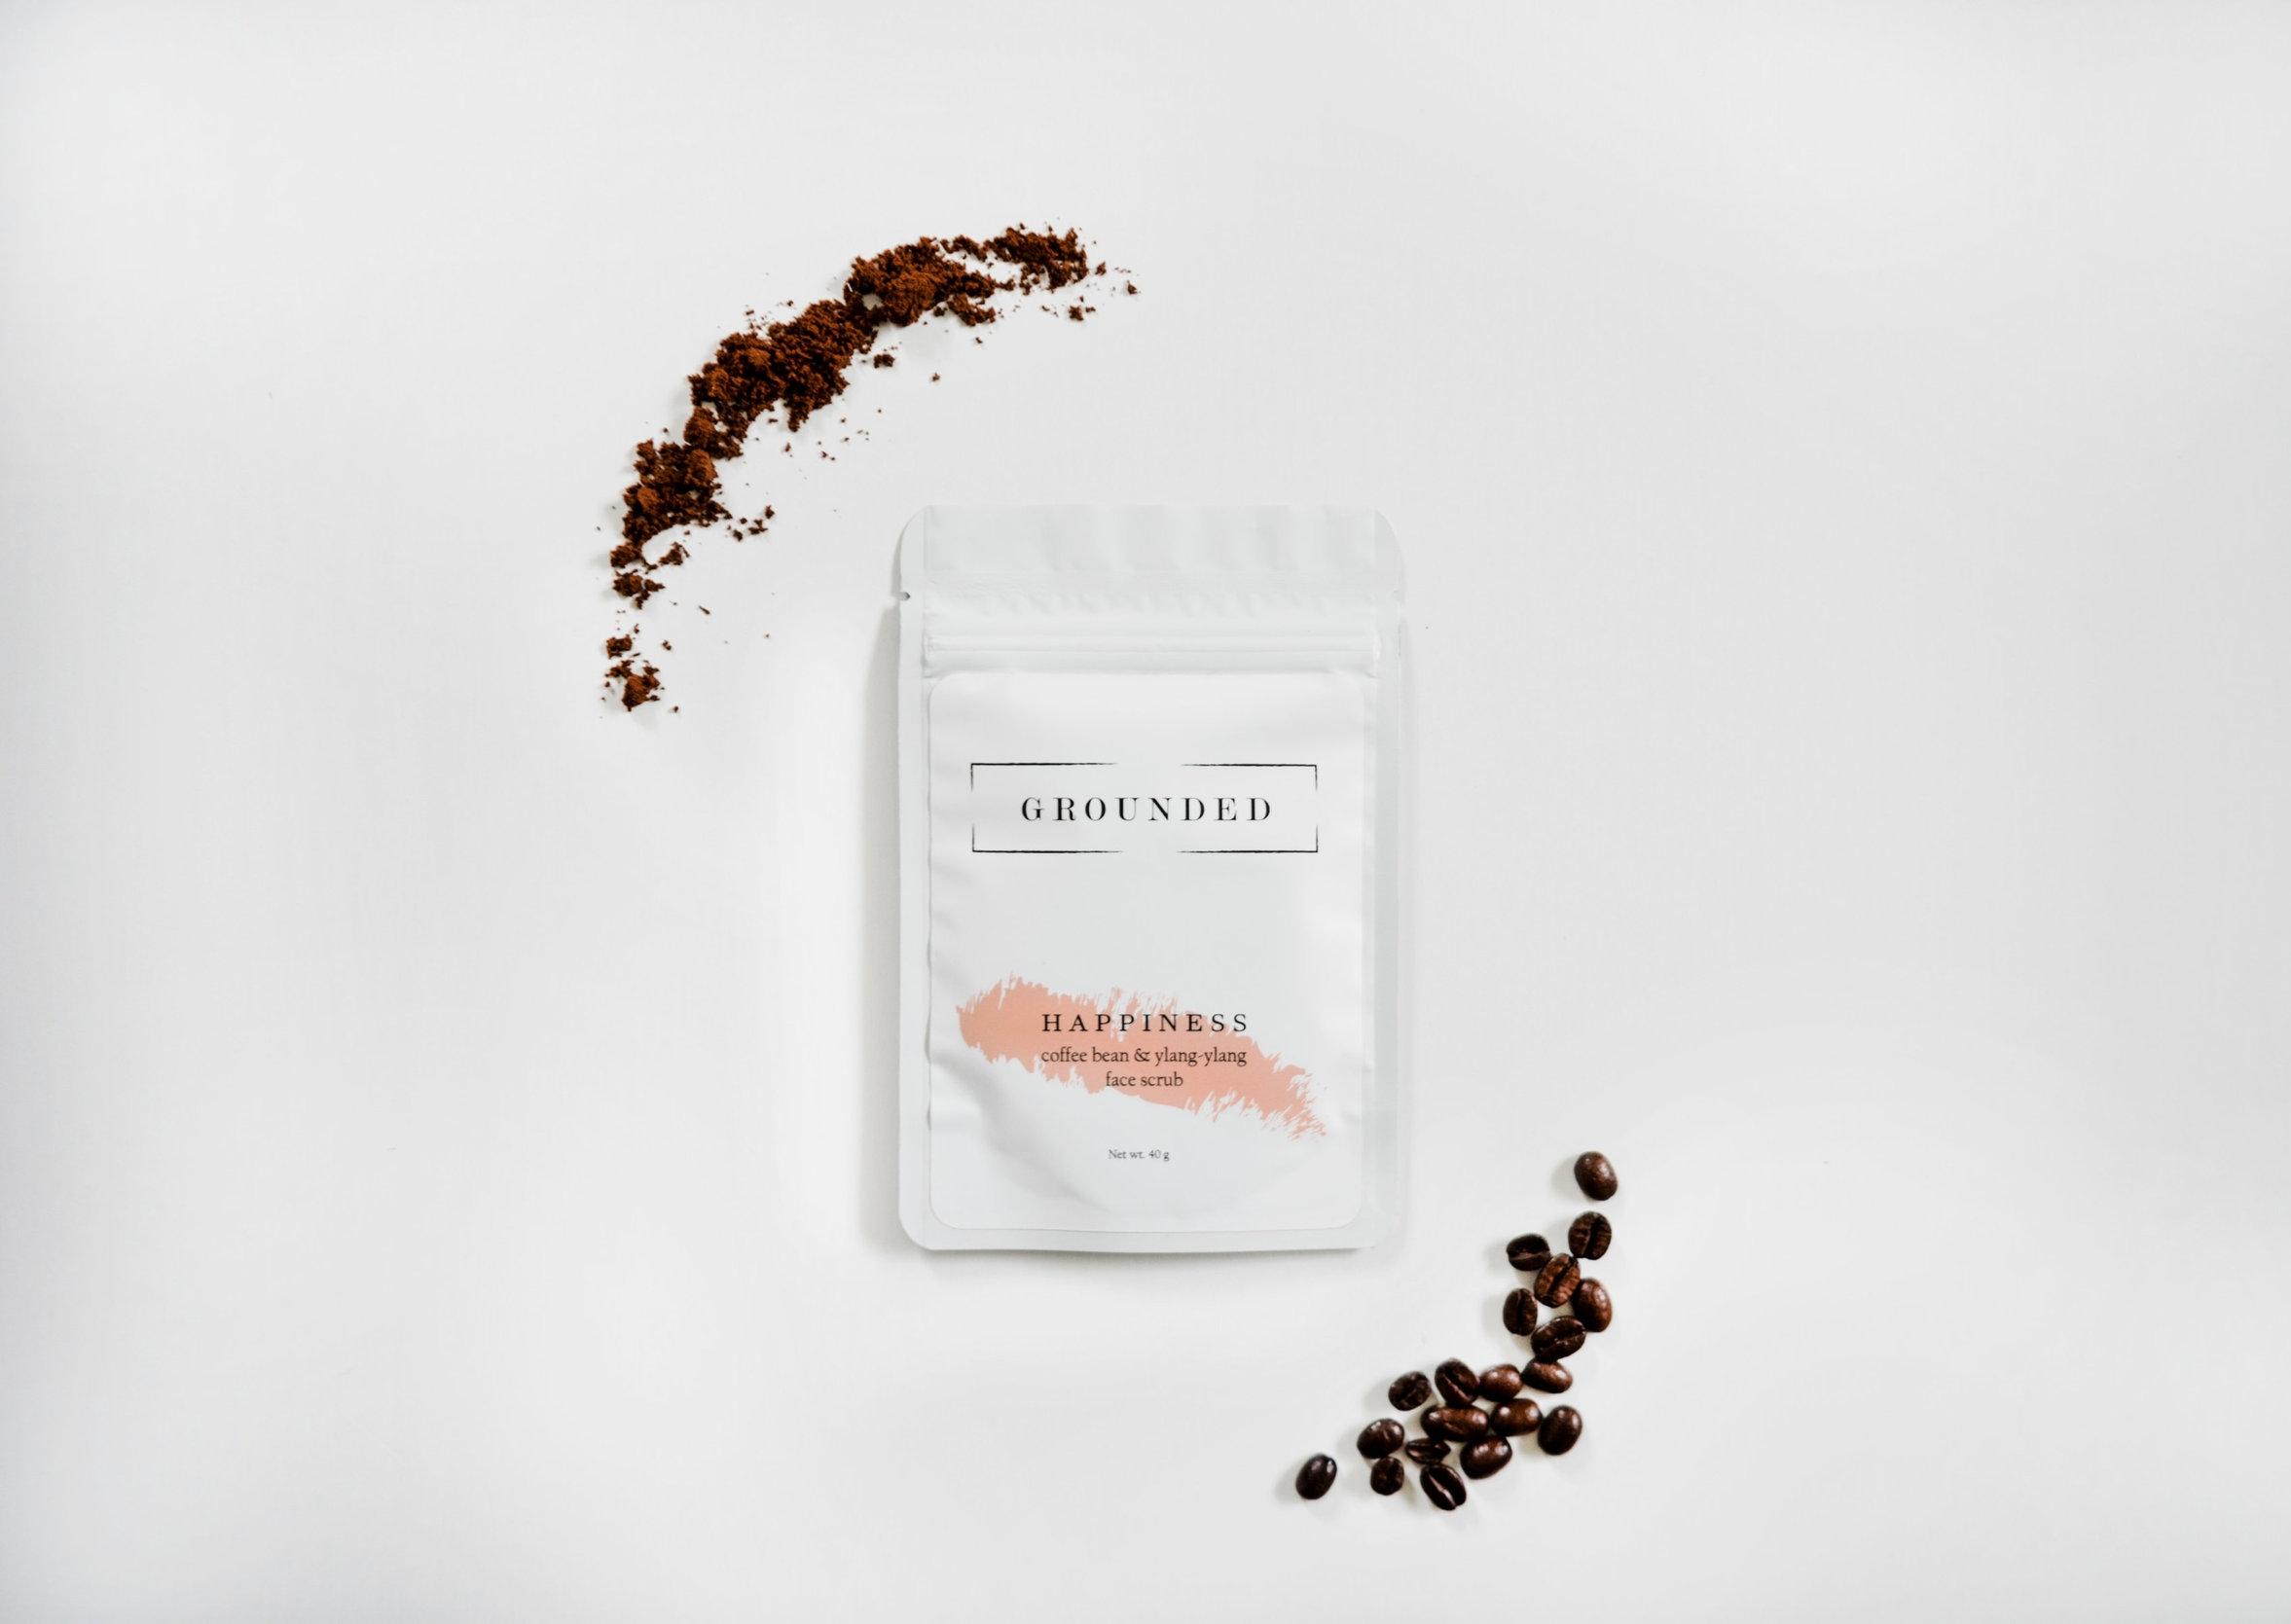 ARABICA COFFEE - Firm & Brighten skinRich in Antioxidantsfights the elementsPerfect exfoliateanti-aging